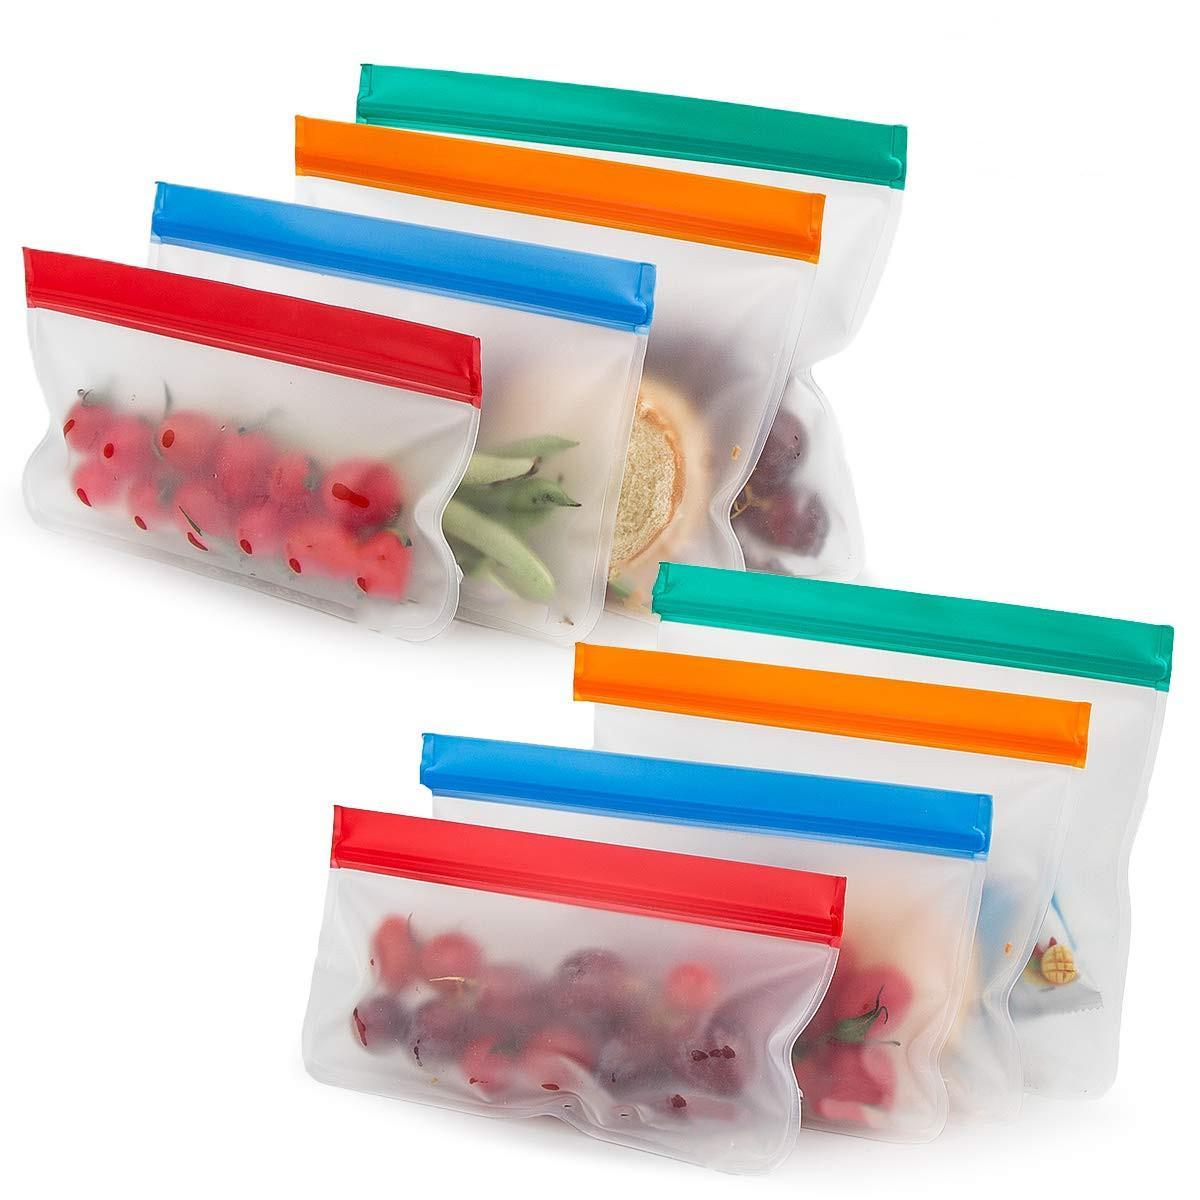 Kitchen Organization Food Fresh Bags Fruit Container Reusable Silicone Ziplock Bag Leakproof Refrigerator Saran Wrap Transparent Pocket Makeup Organizer